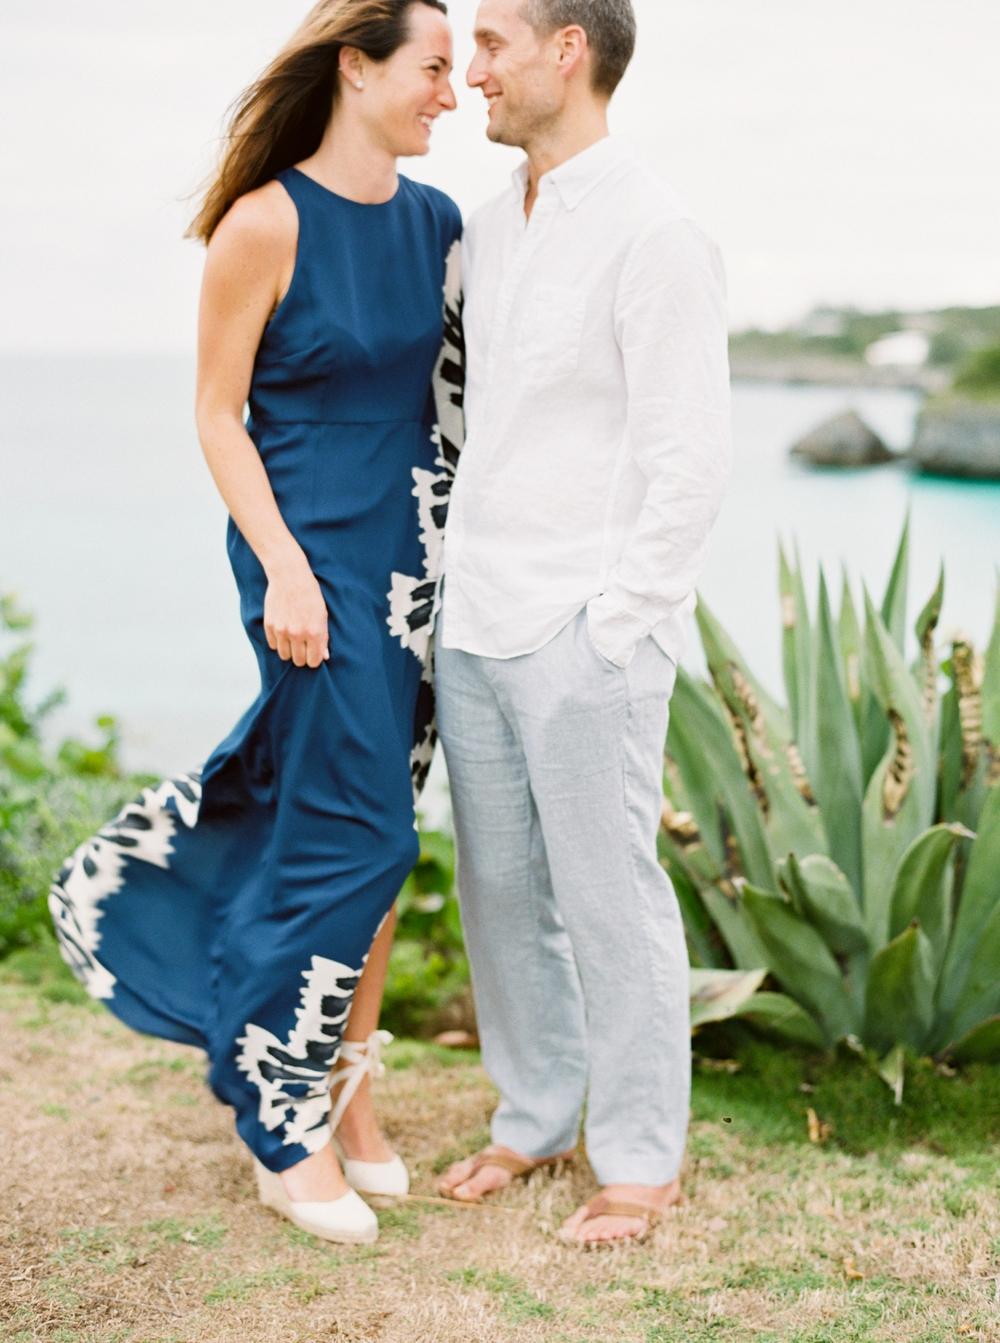 Bahamas_Destination_Wedding_Photographer_0632.jpg